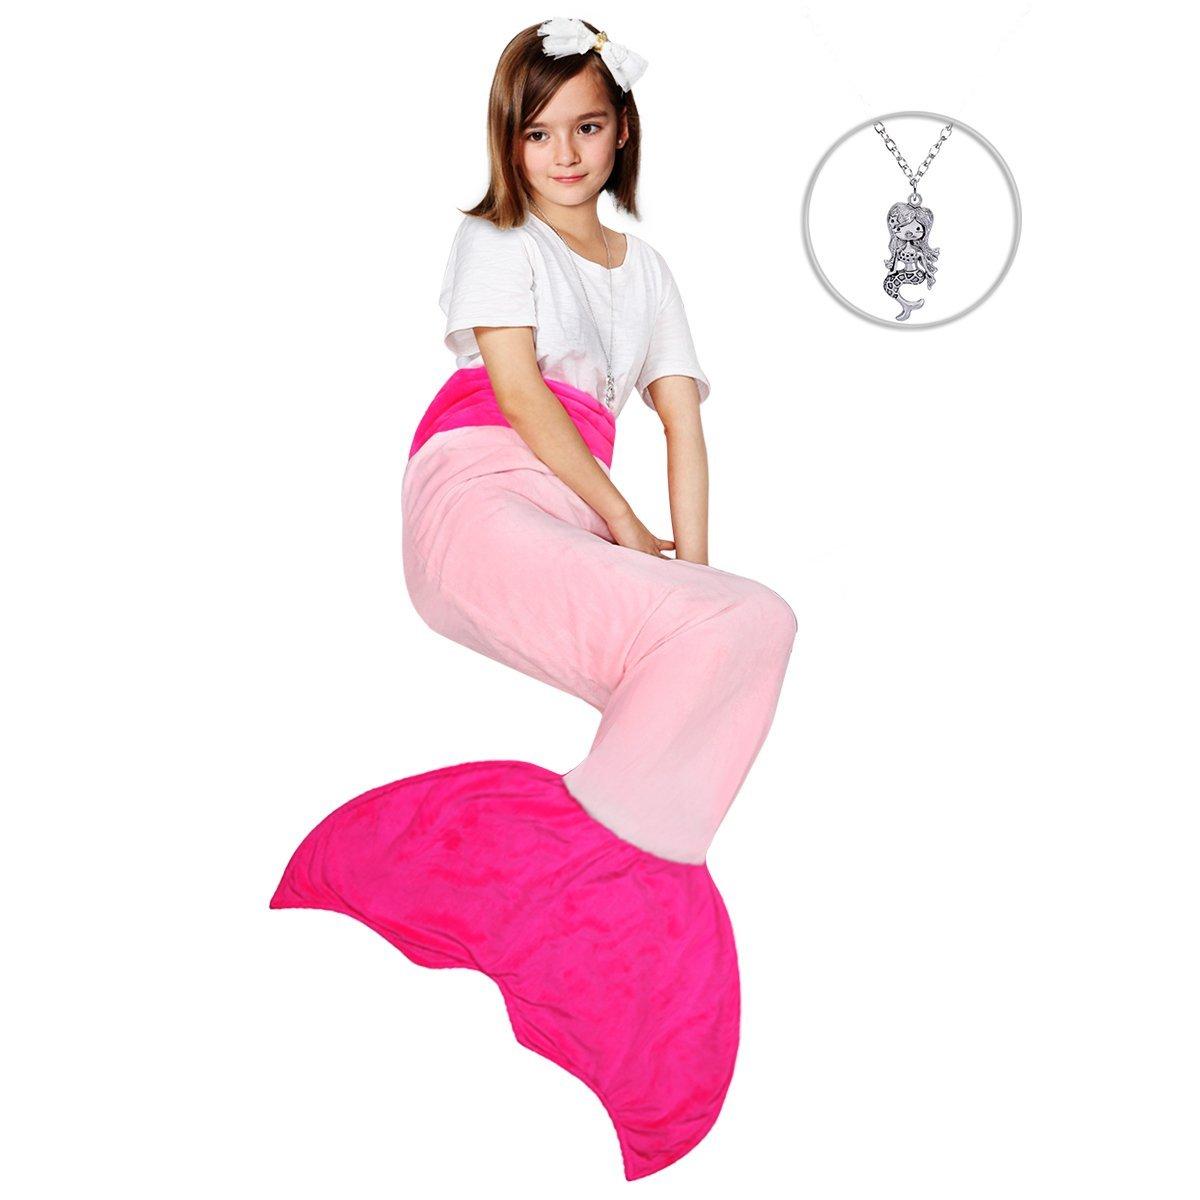 Maidream Mermaid Tail Blanket Upgraded Double-layered Sof...